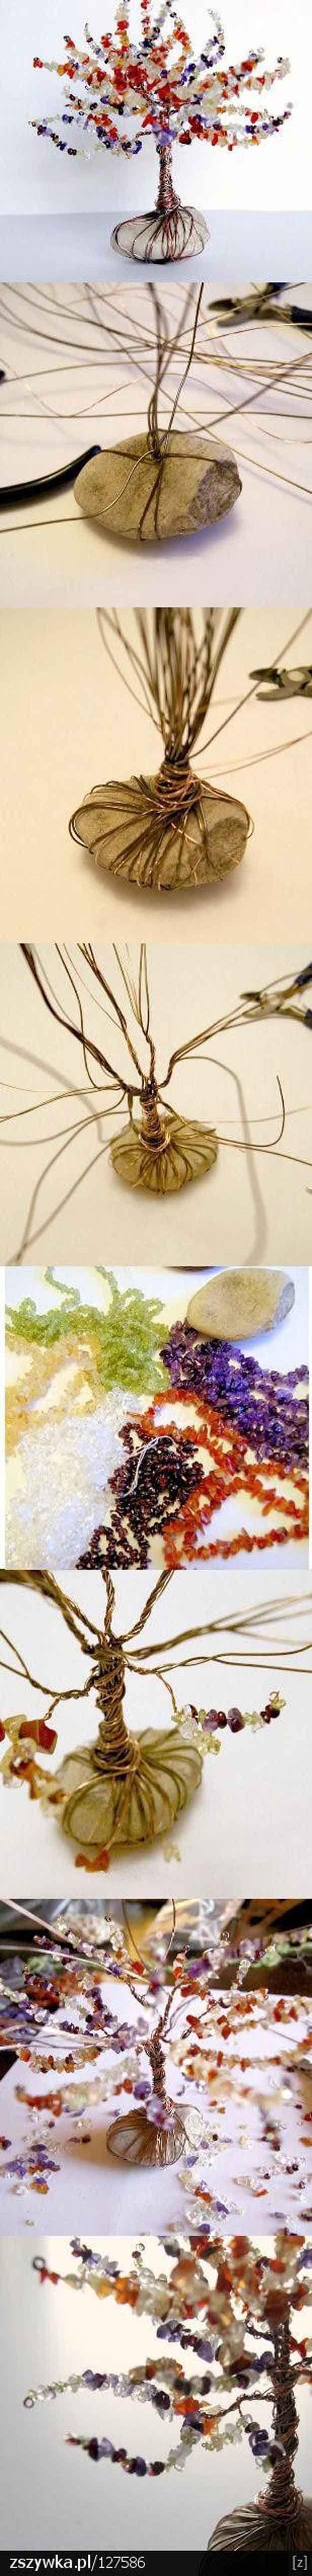 Fun DIY Tree of LIfe Decoration and Ideas   https://diyprojects.com/12-diy-tree-of-life-ideas/